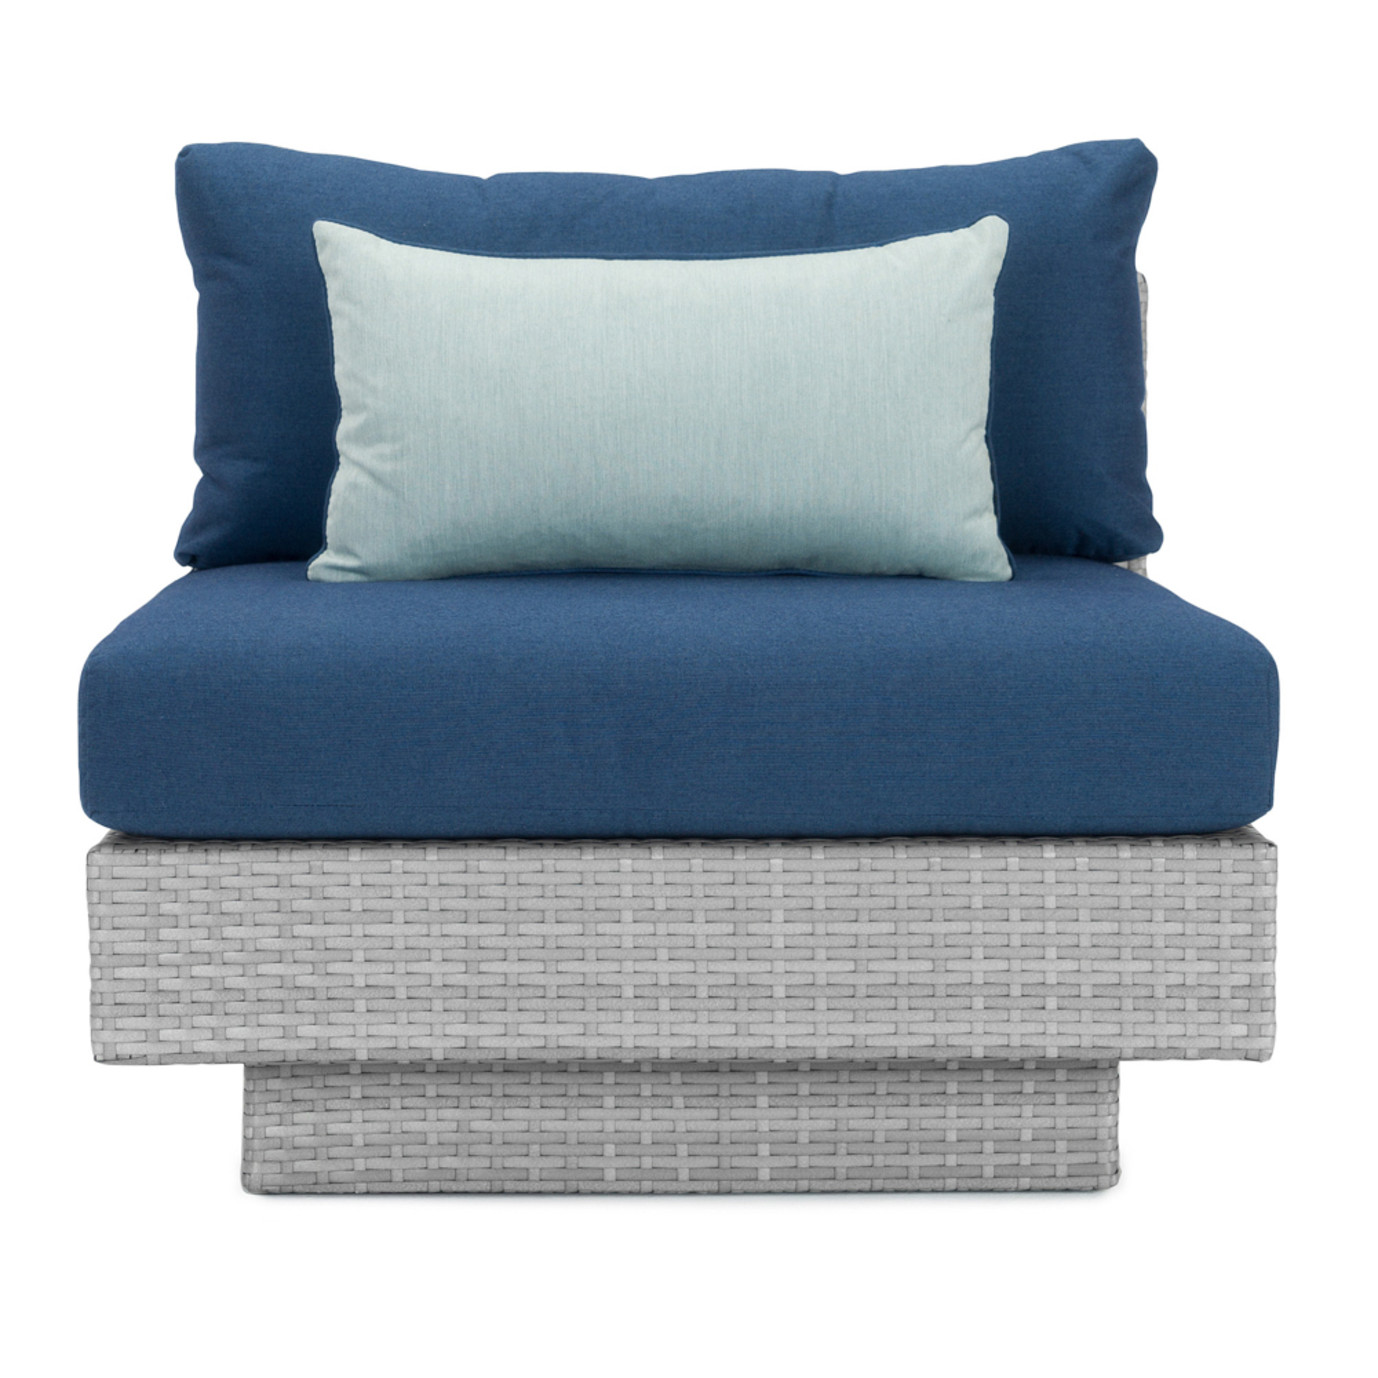 Portofino® Comfort Single Armless Chair - Laguna Blue